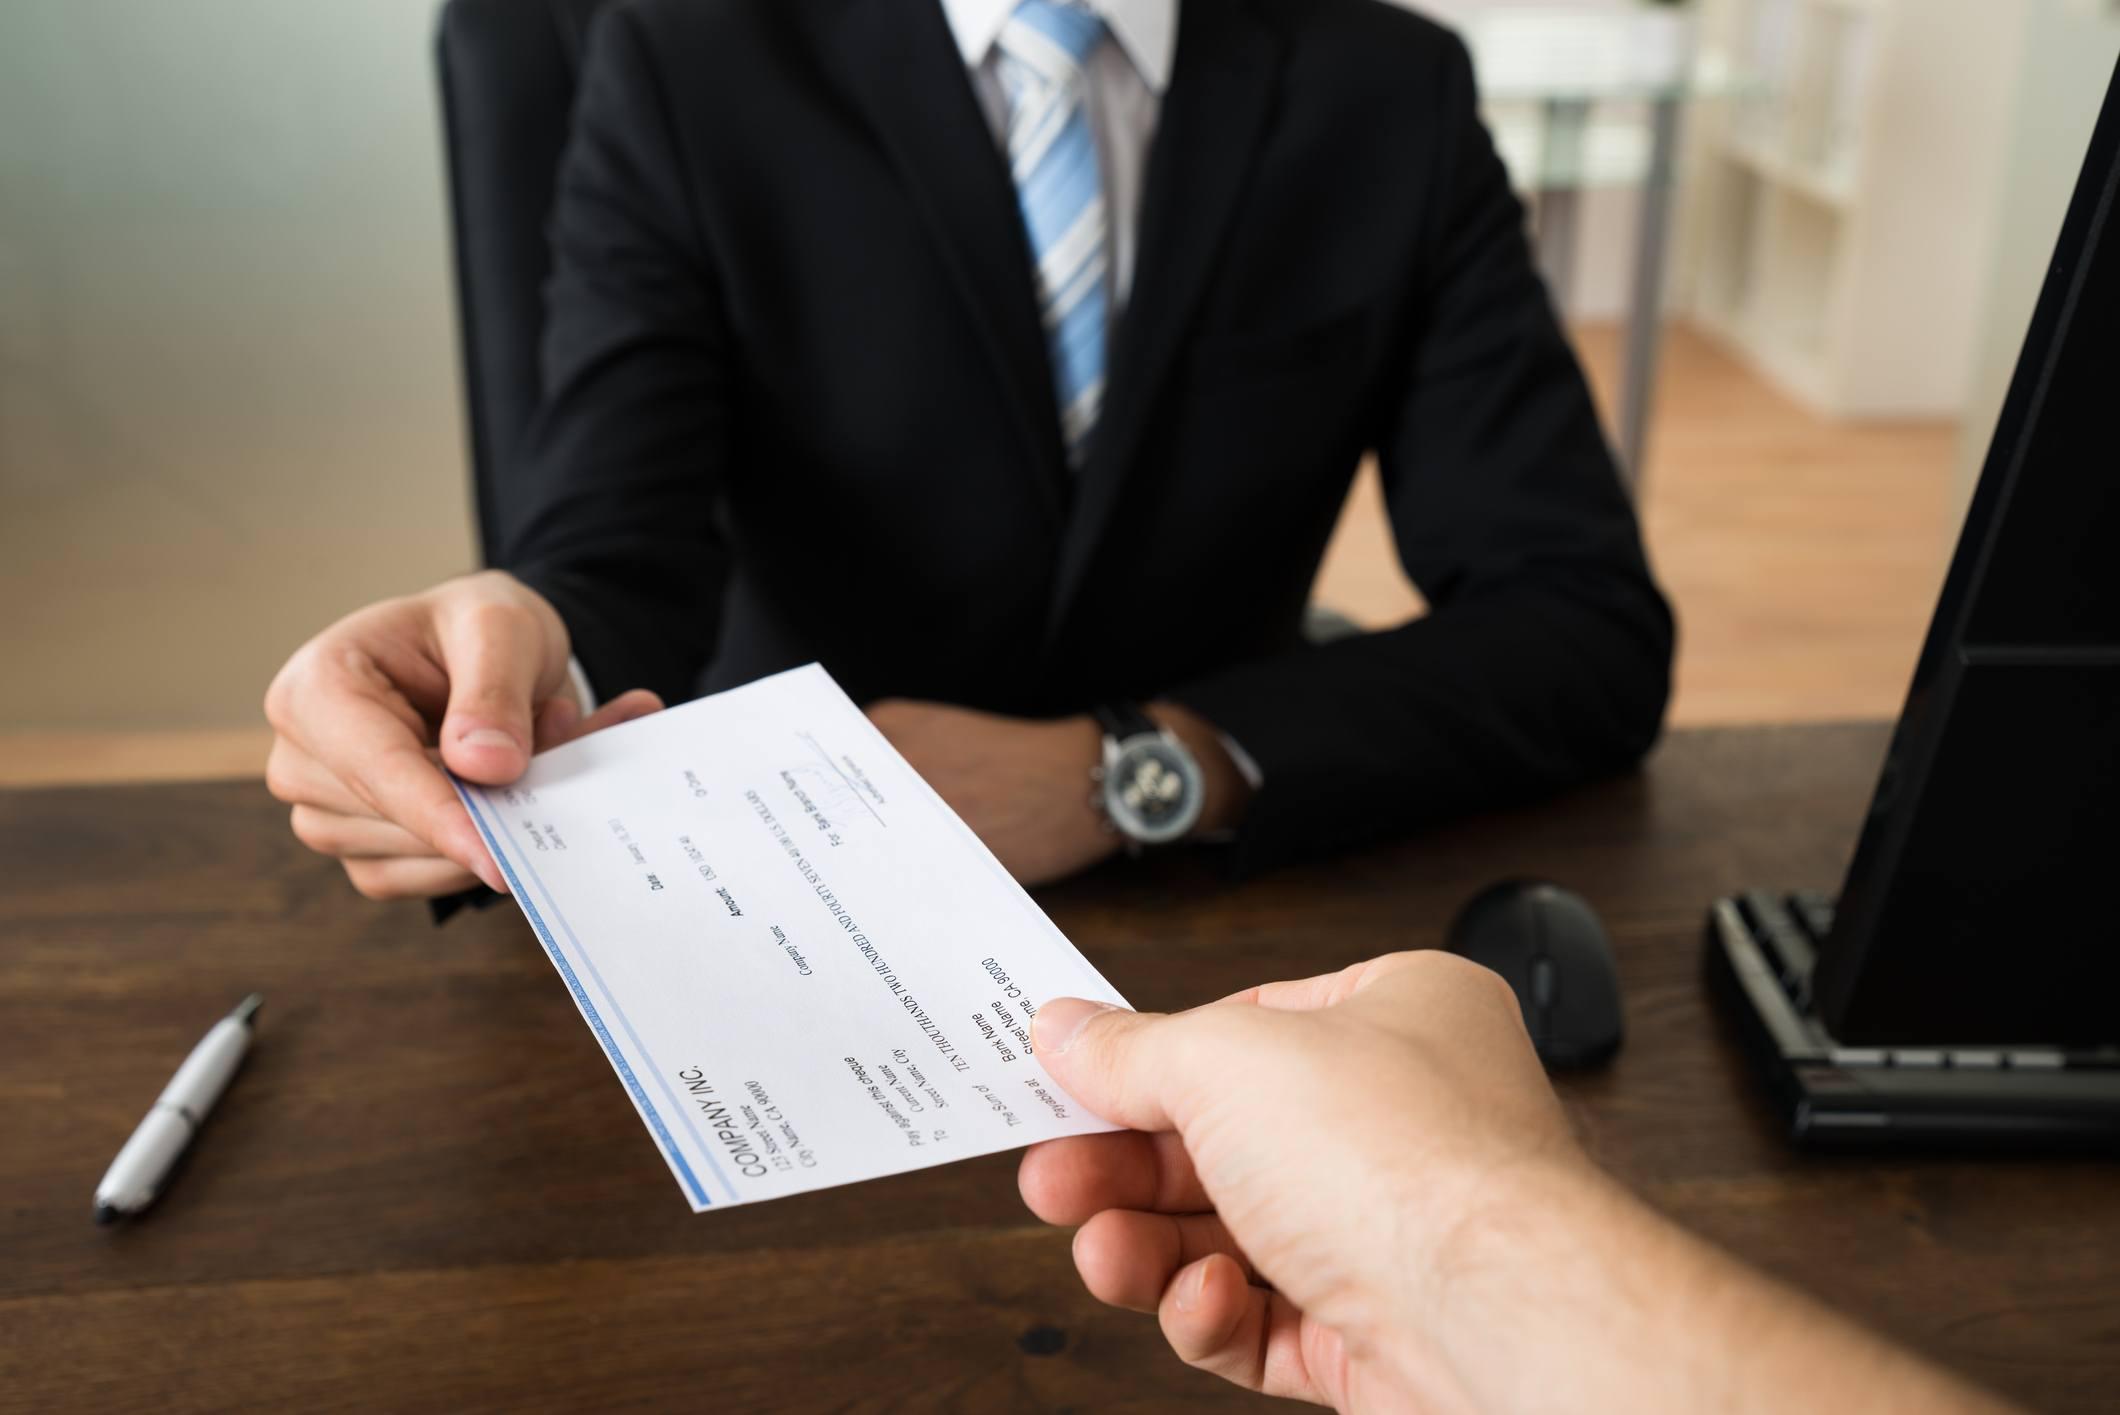 Businessman handing over a check